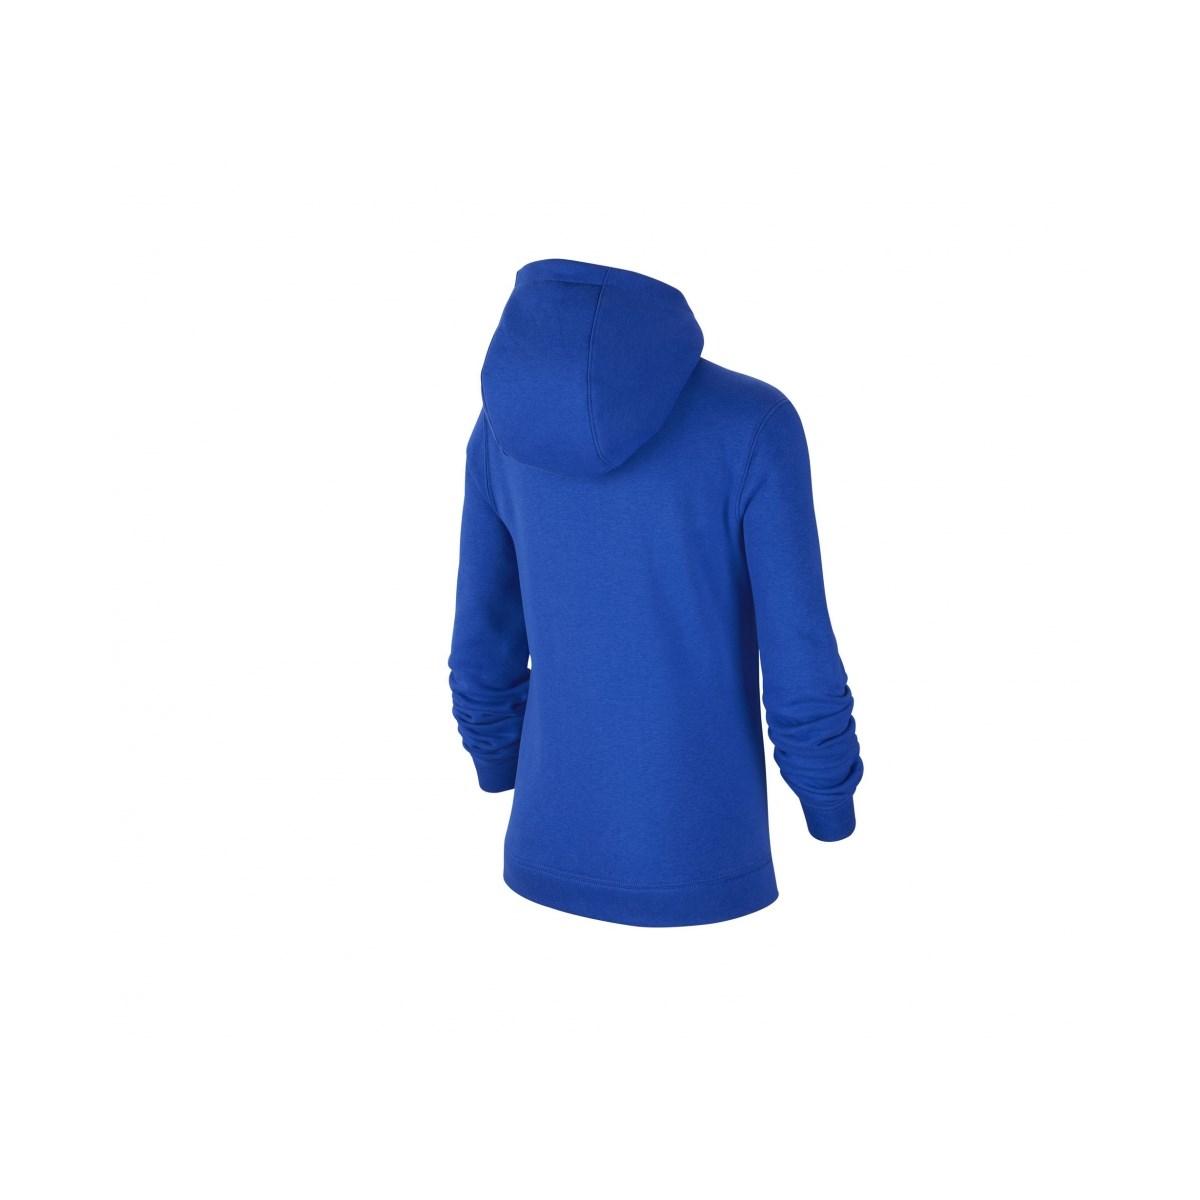 Hoodie Club Çocuk Mavi Sweatshirt